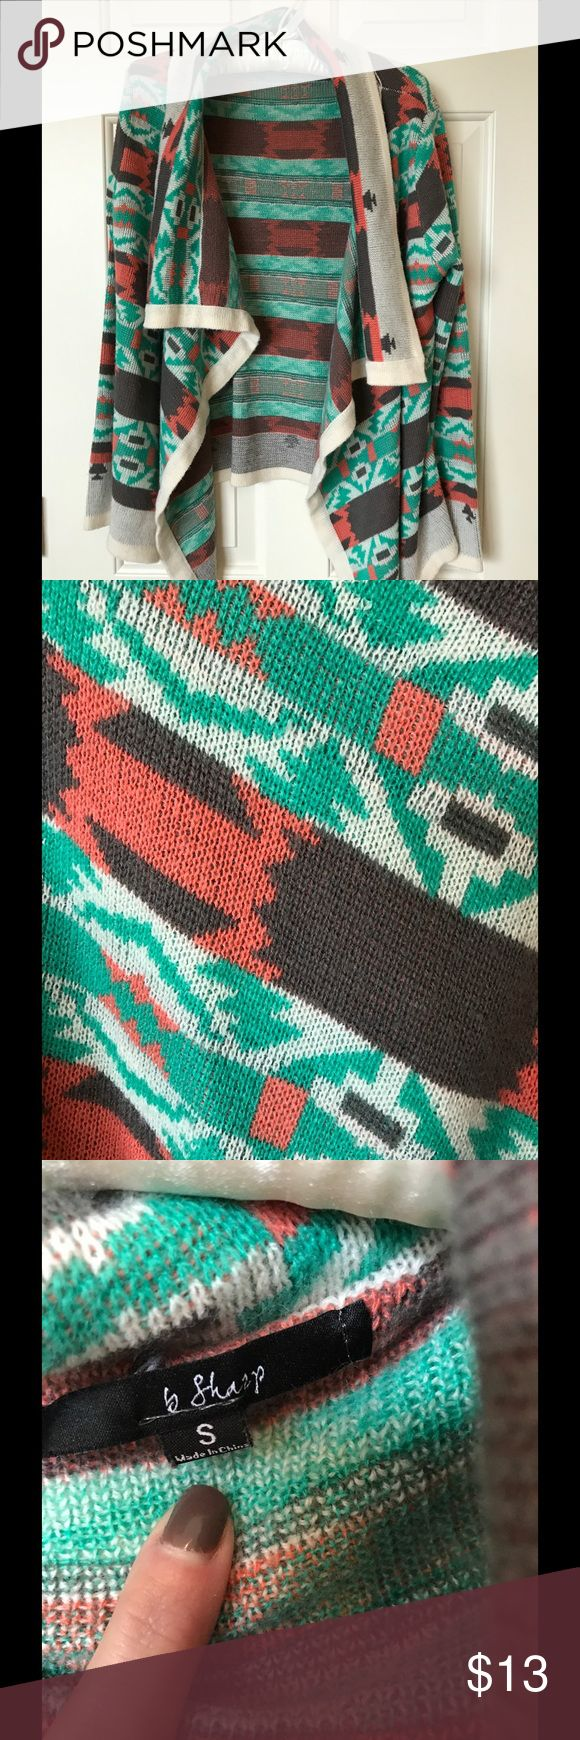 Small Aztec cardigan sweater Small Aztec cardigan sweater Sweaters Cardigans